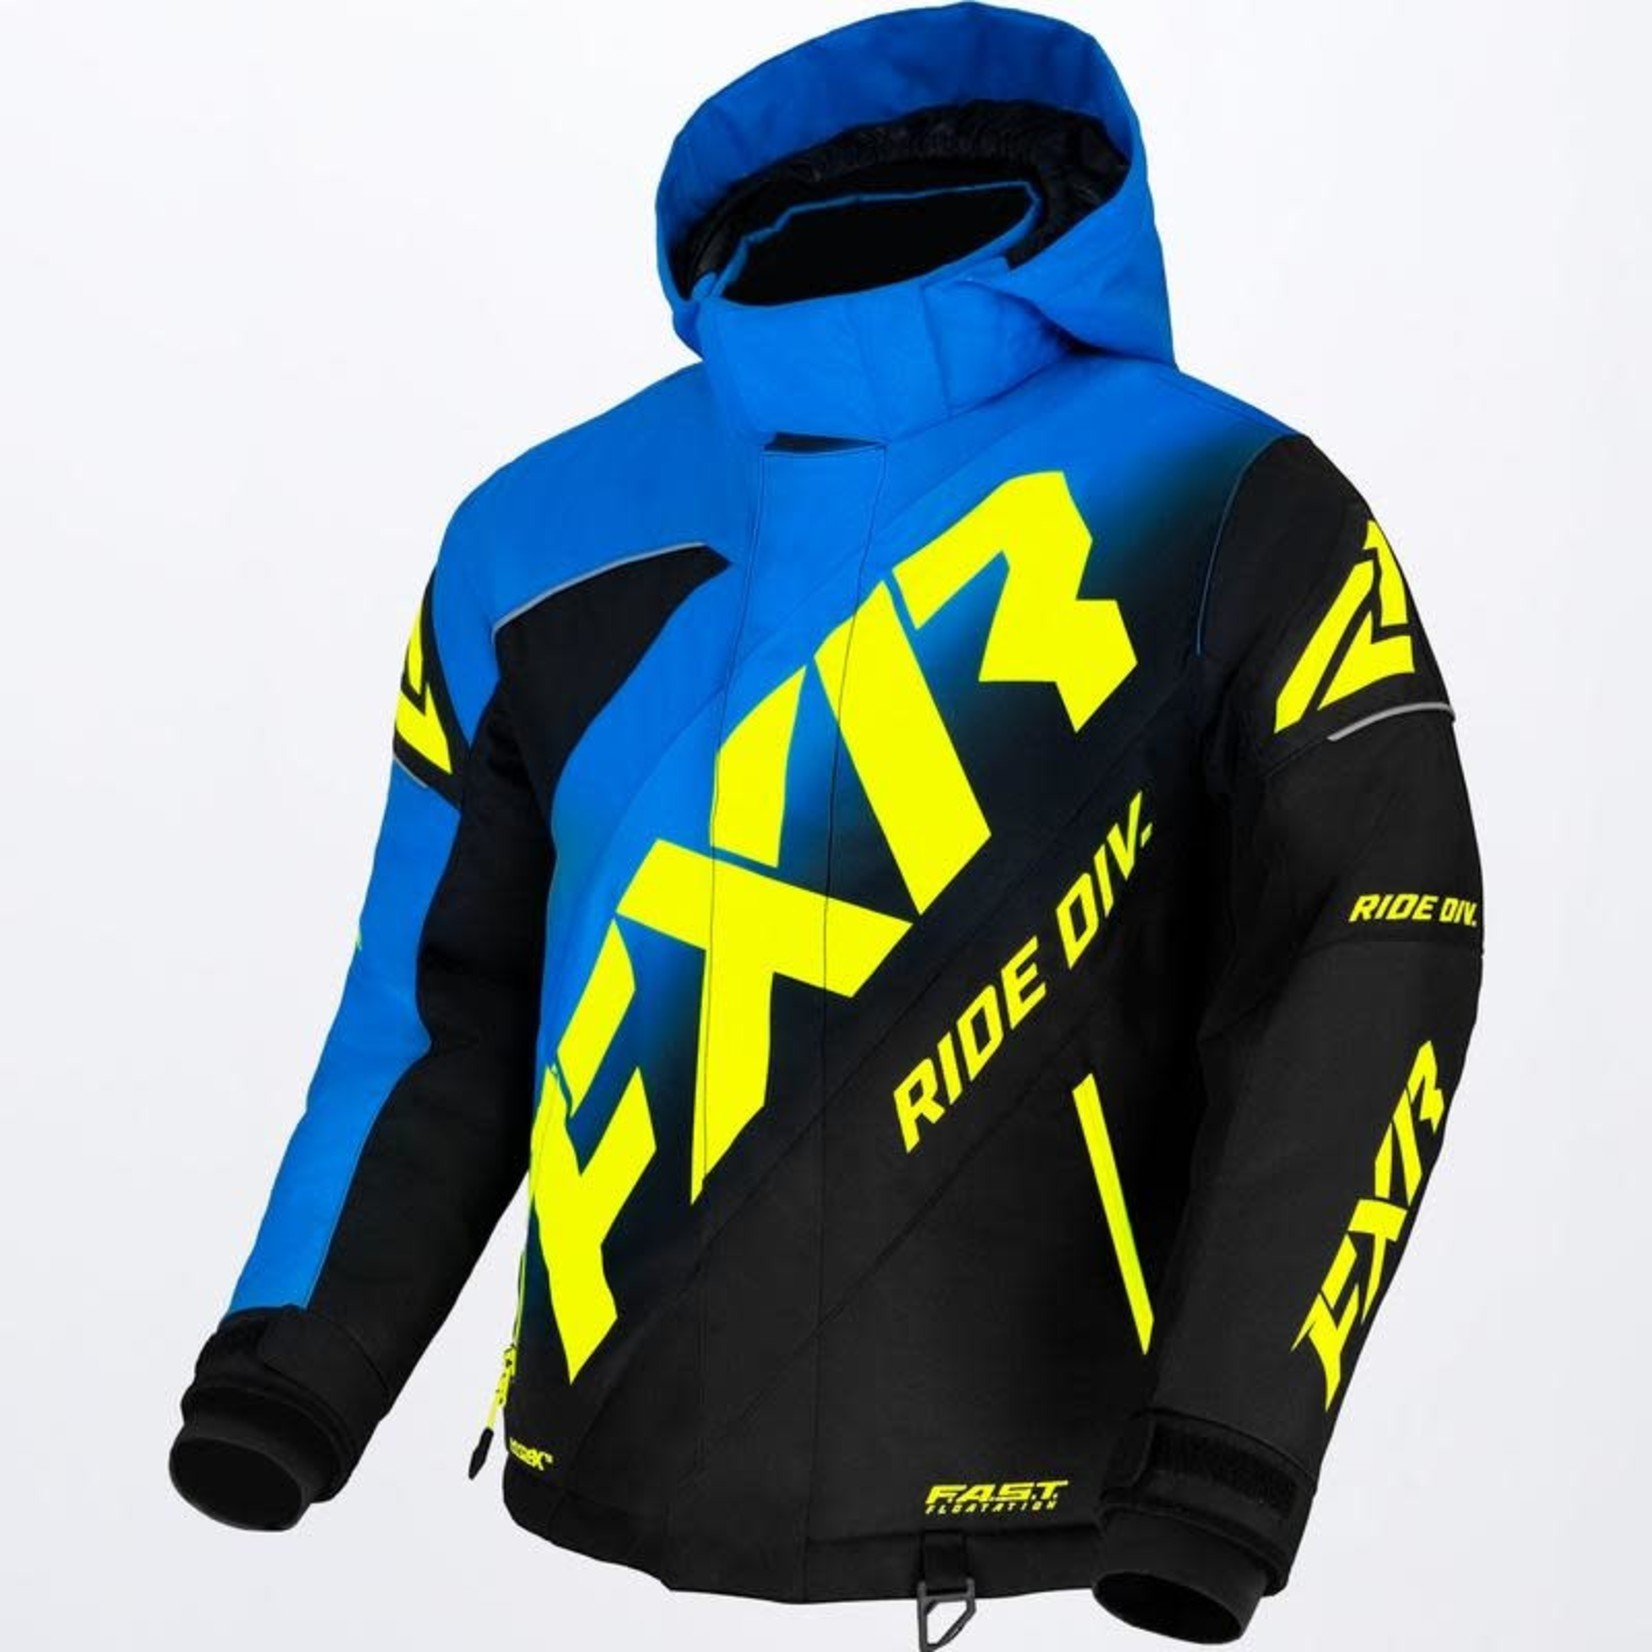 FXR FXR Winter Jacket, CX, Child, Boys